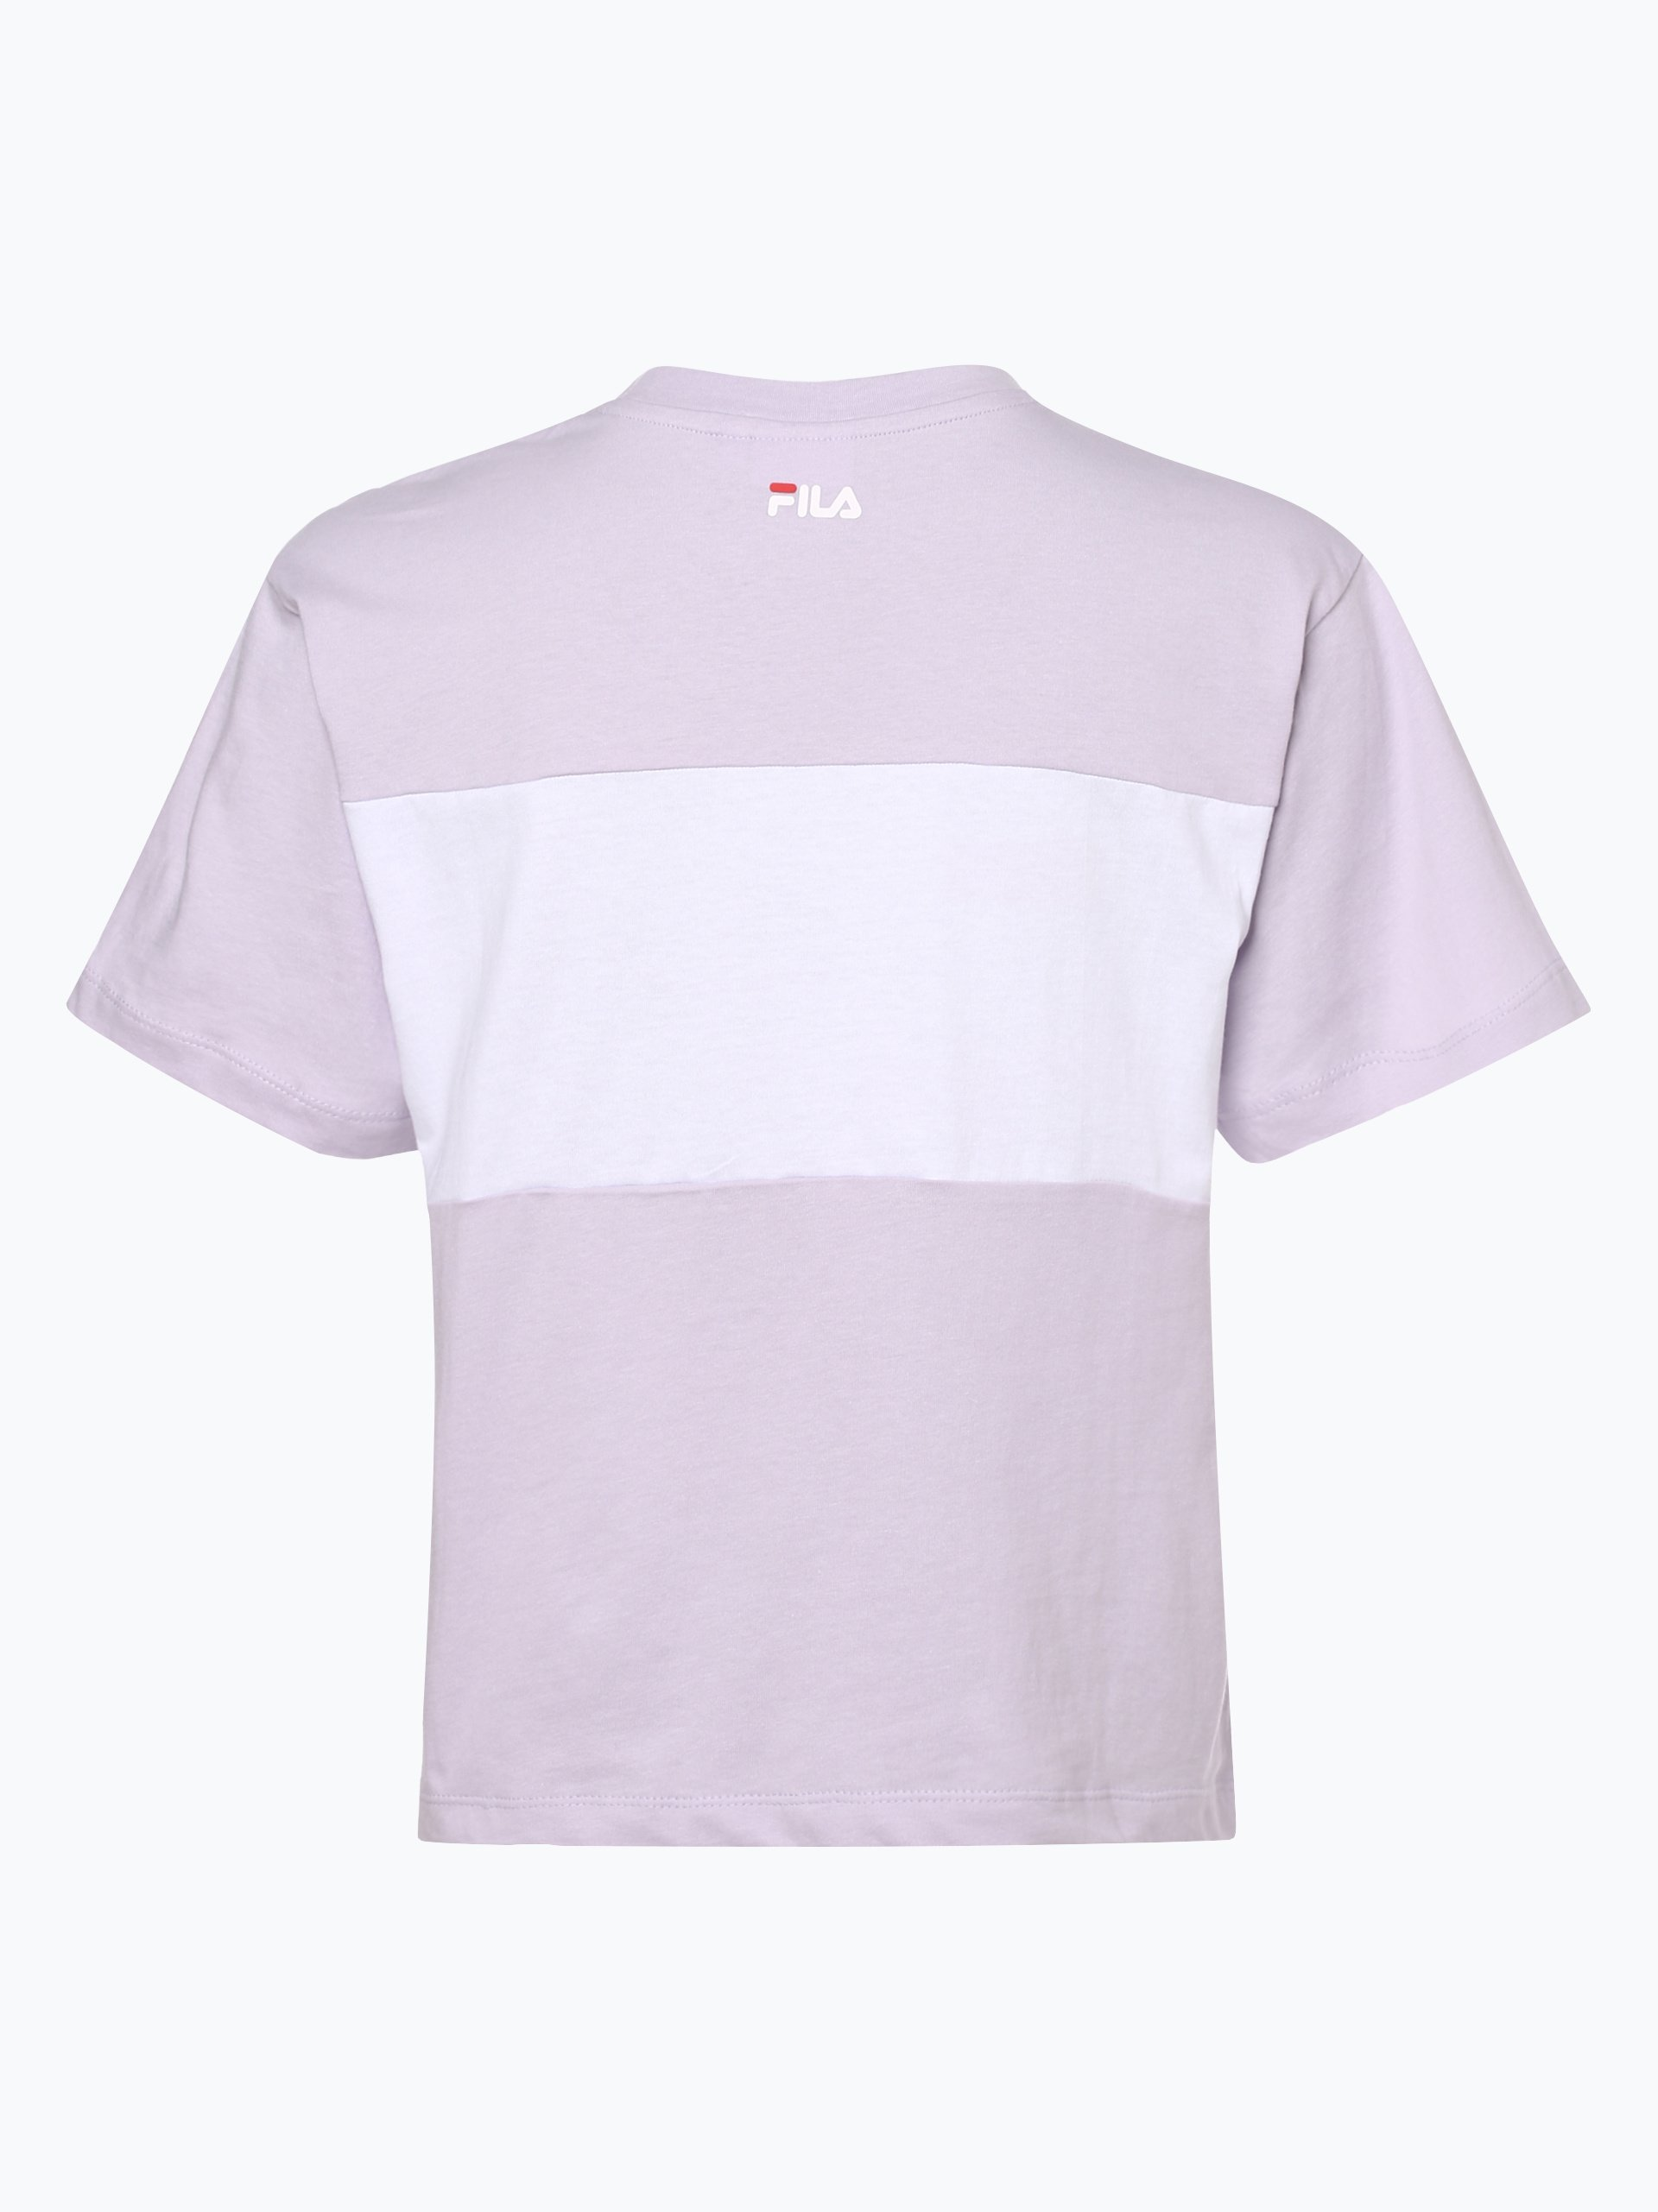 FILA Damen T-Shirt - Allison